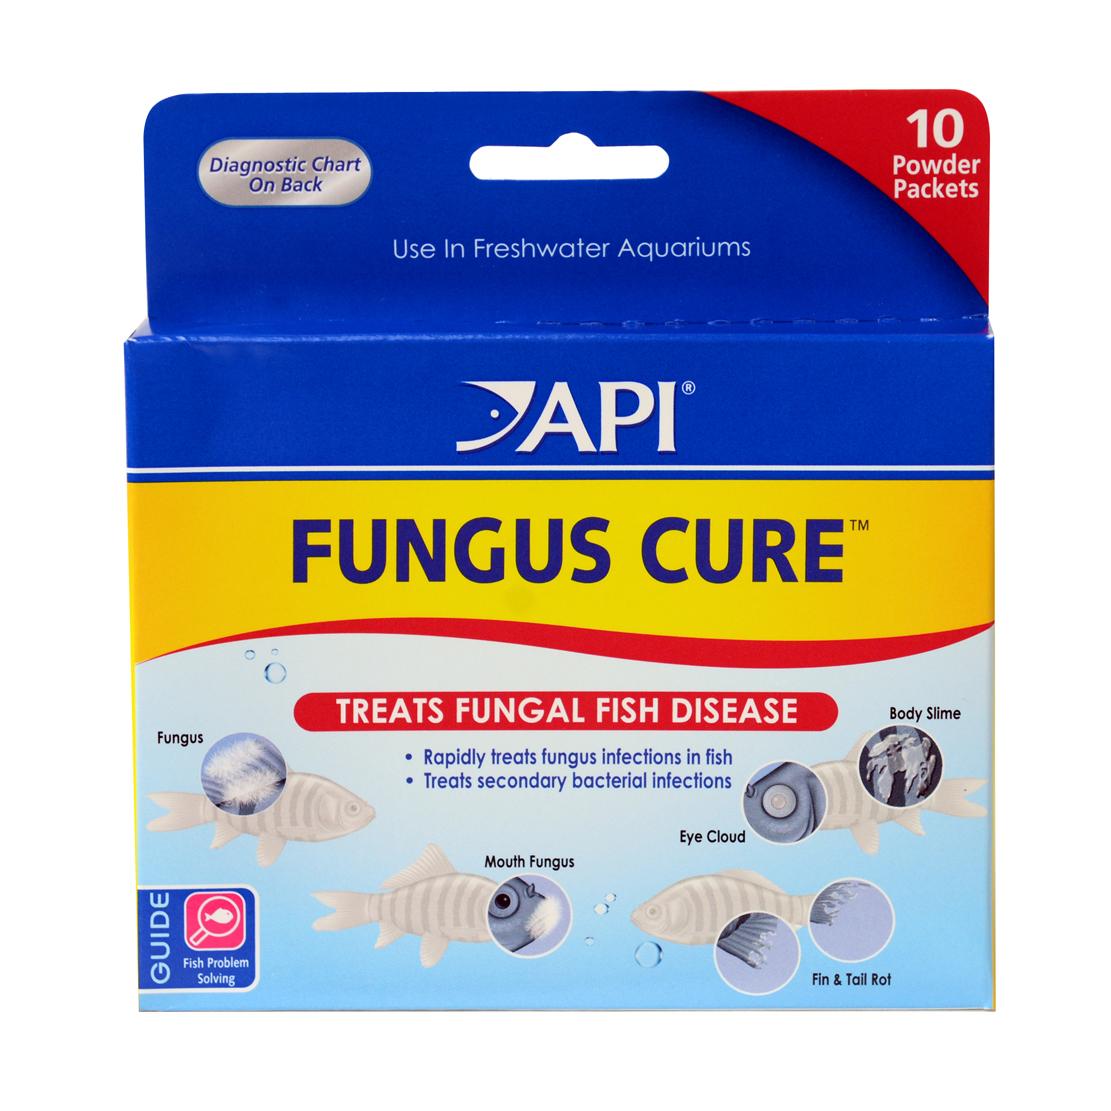 FUNGUS CURE™